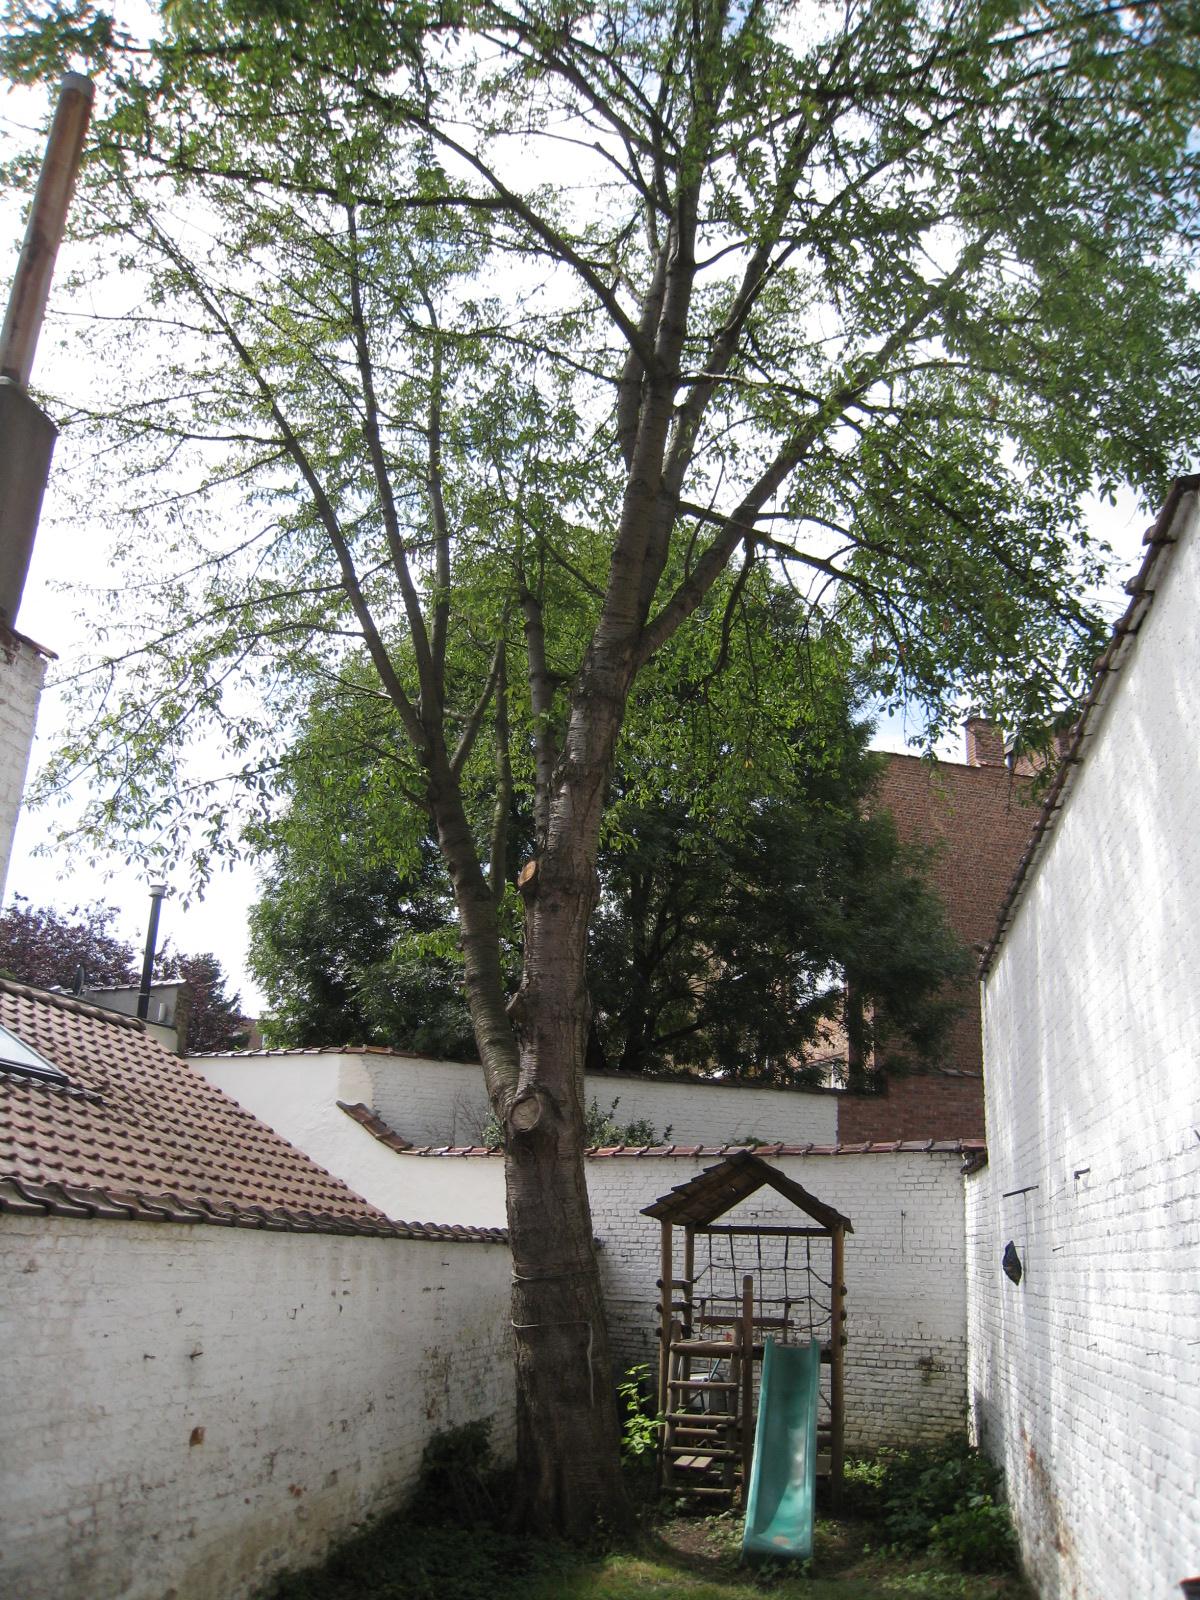 Merisier – Ixelles, Chaussée de Boondael, 487 –  21 Août 2009